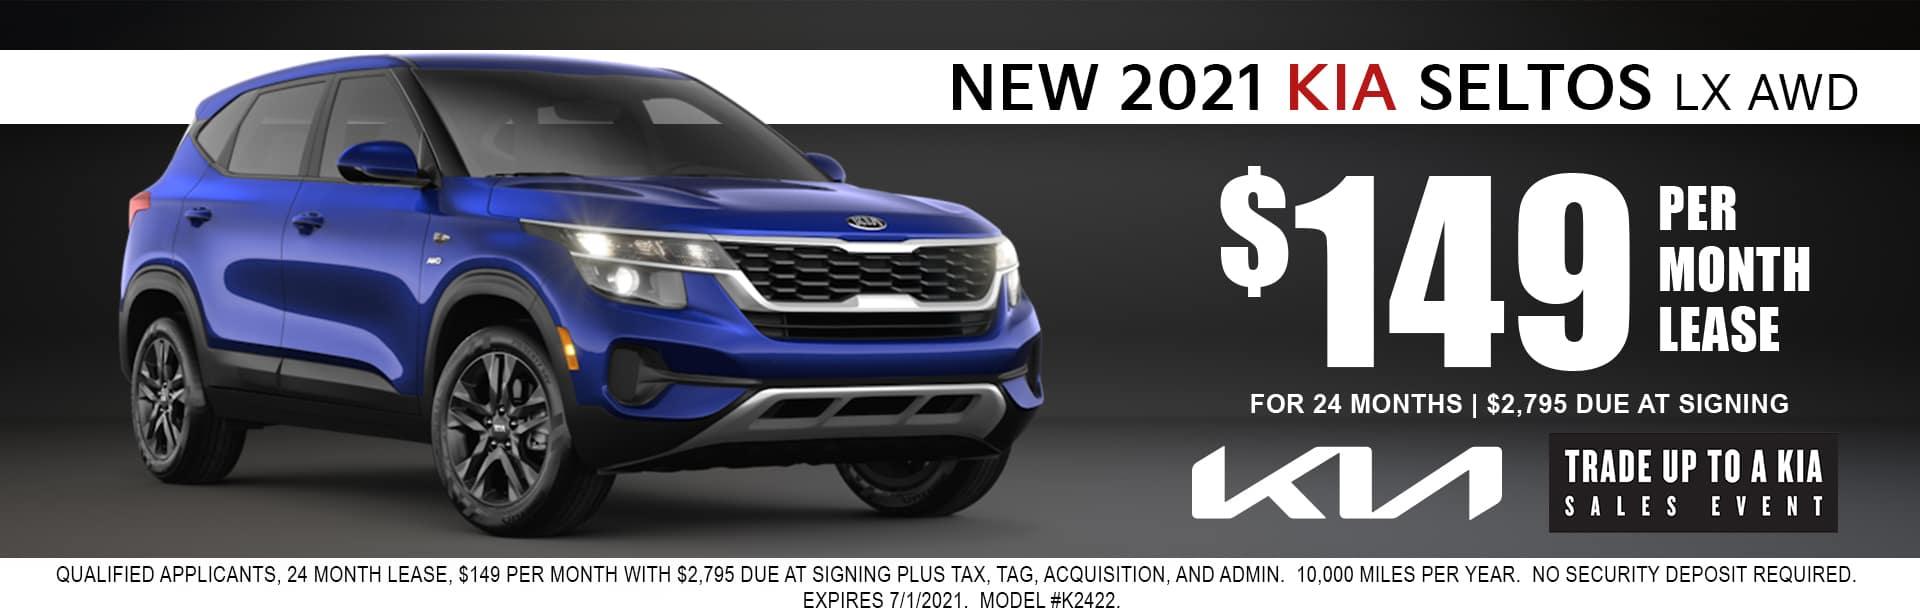 2021 Kia Seltos lease for $149/mo